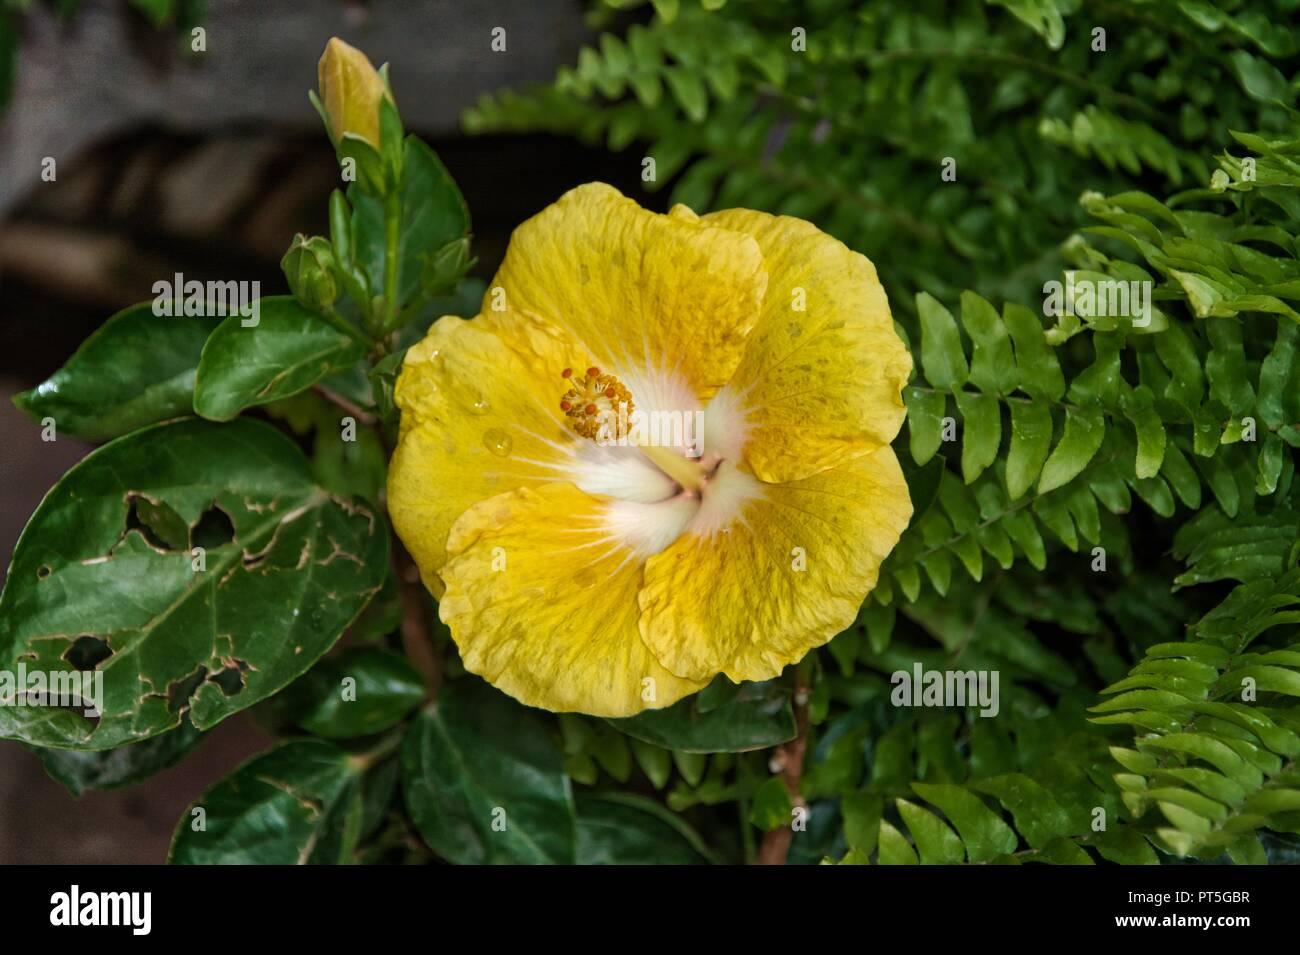 Hibiscus Yellow Flower Stock Photo 221398795 Alamy